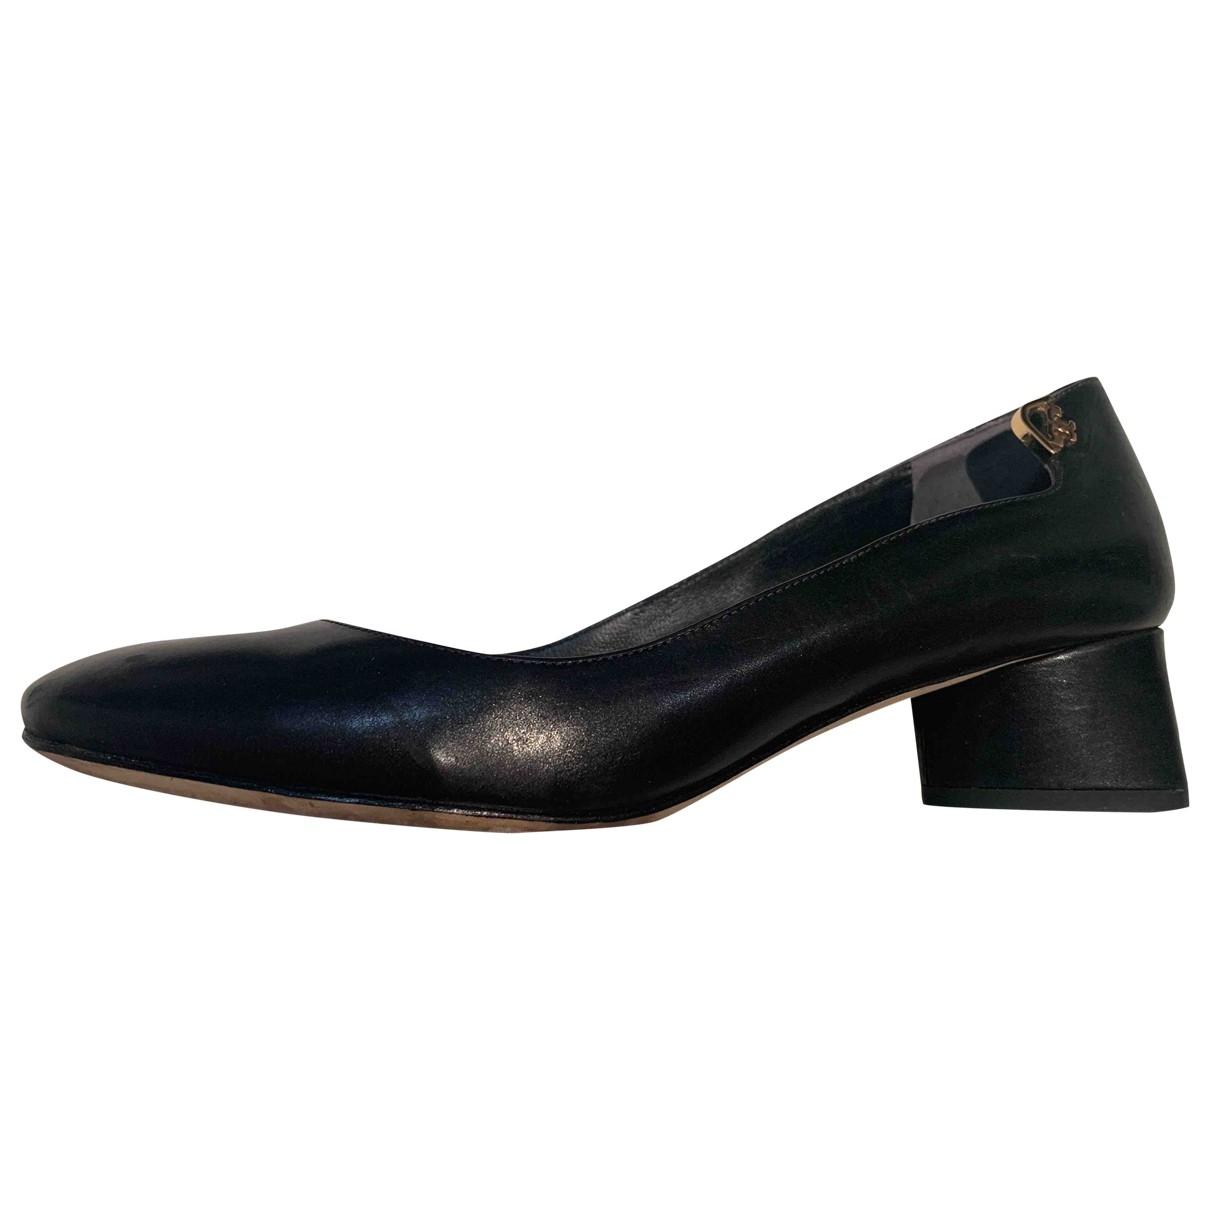 Tory Burch \N Black Leather Heels for Women 7.5 US